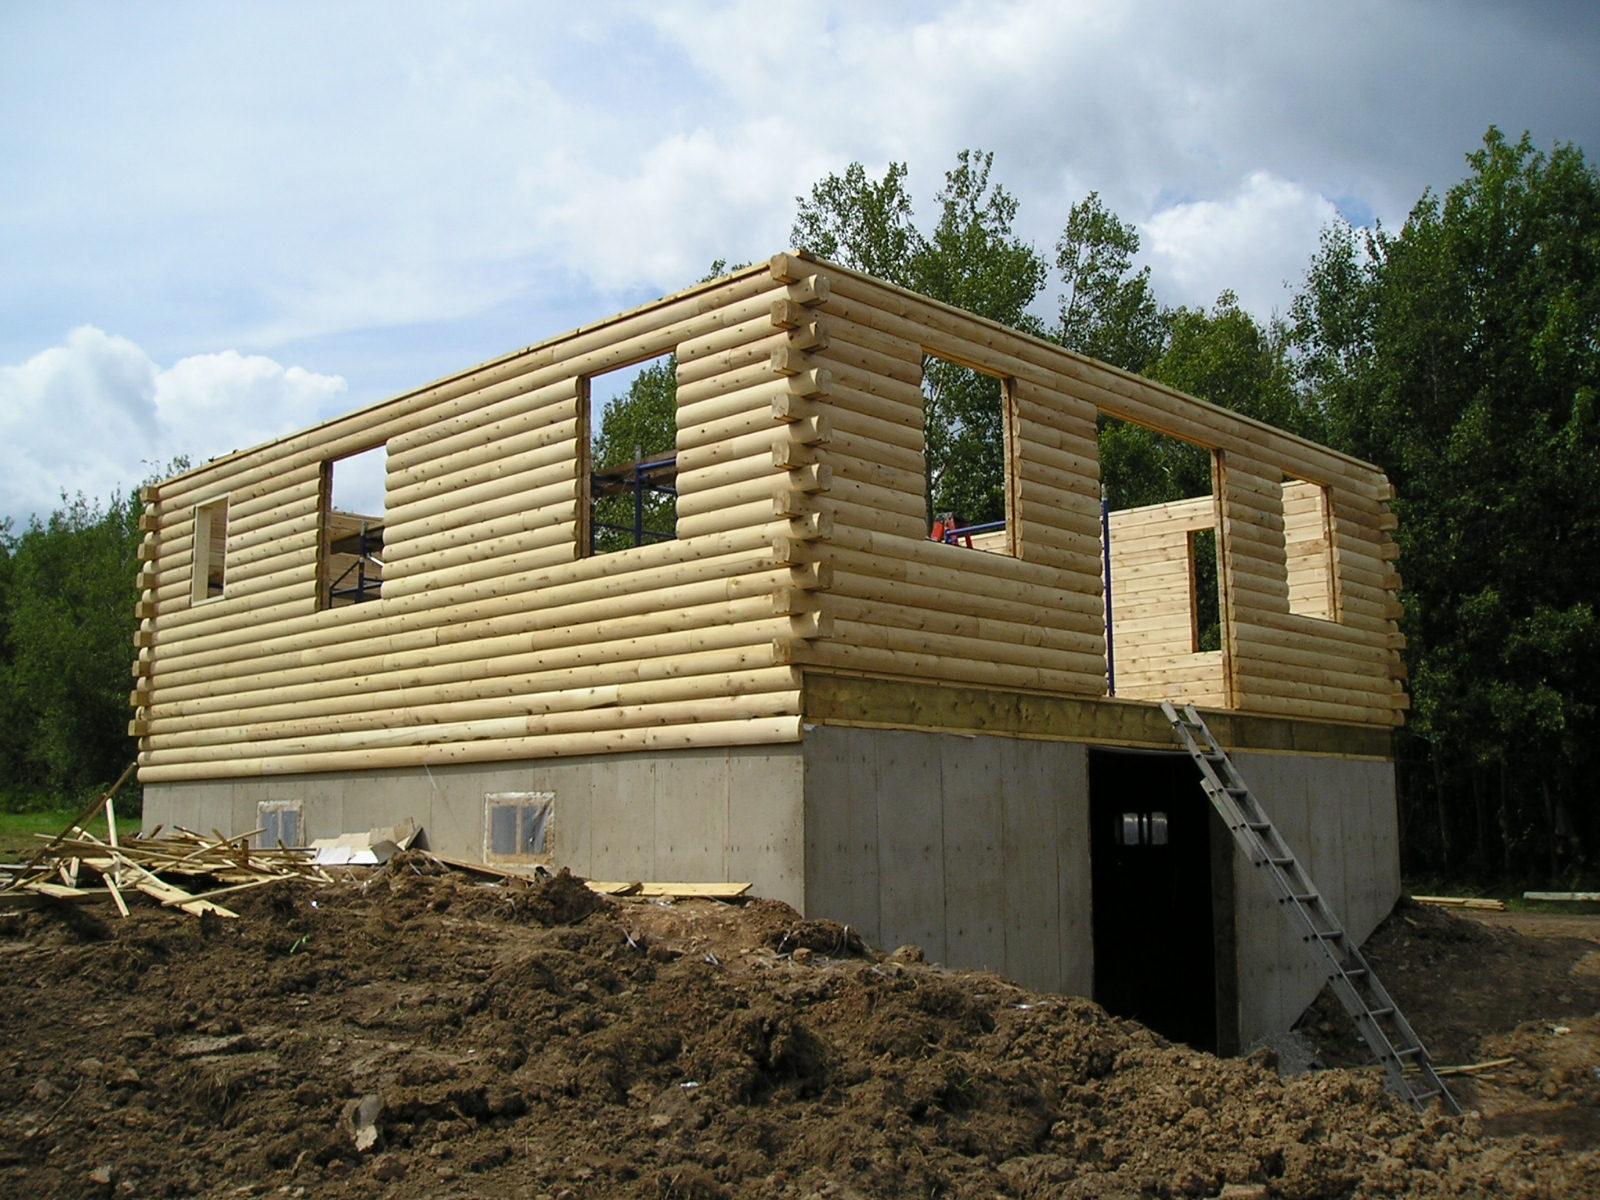 51 Tiny Log Cabin Kits Oregon Small Cabins With Loft